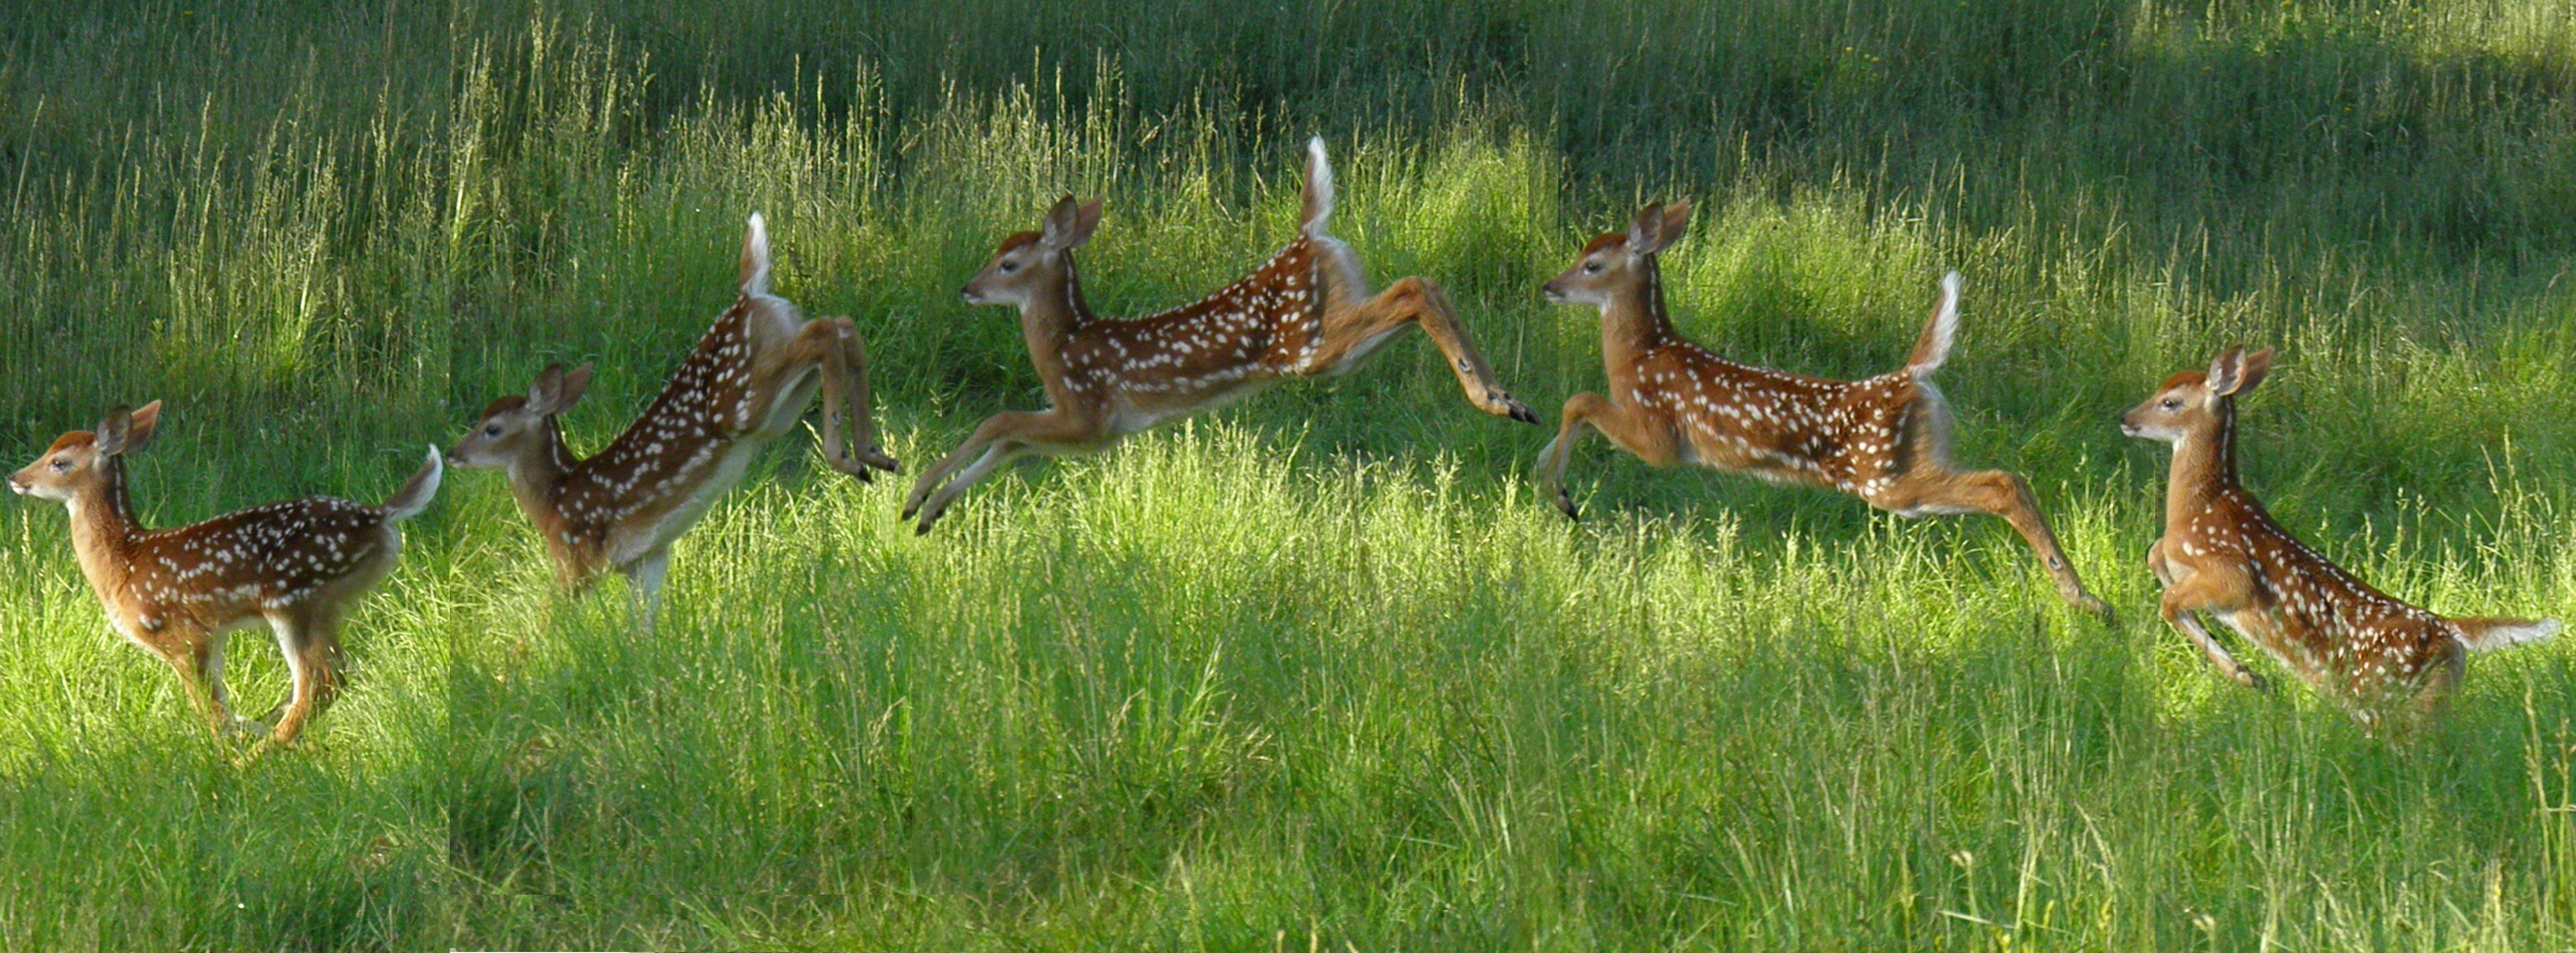 deer jump - Google 검색